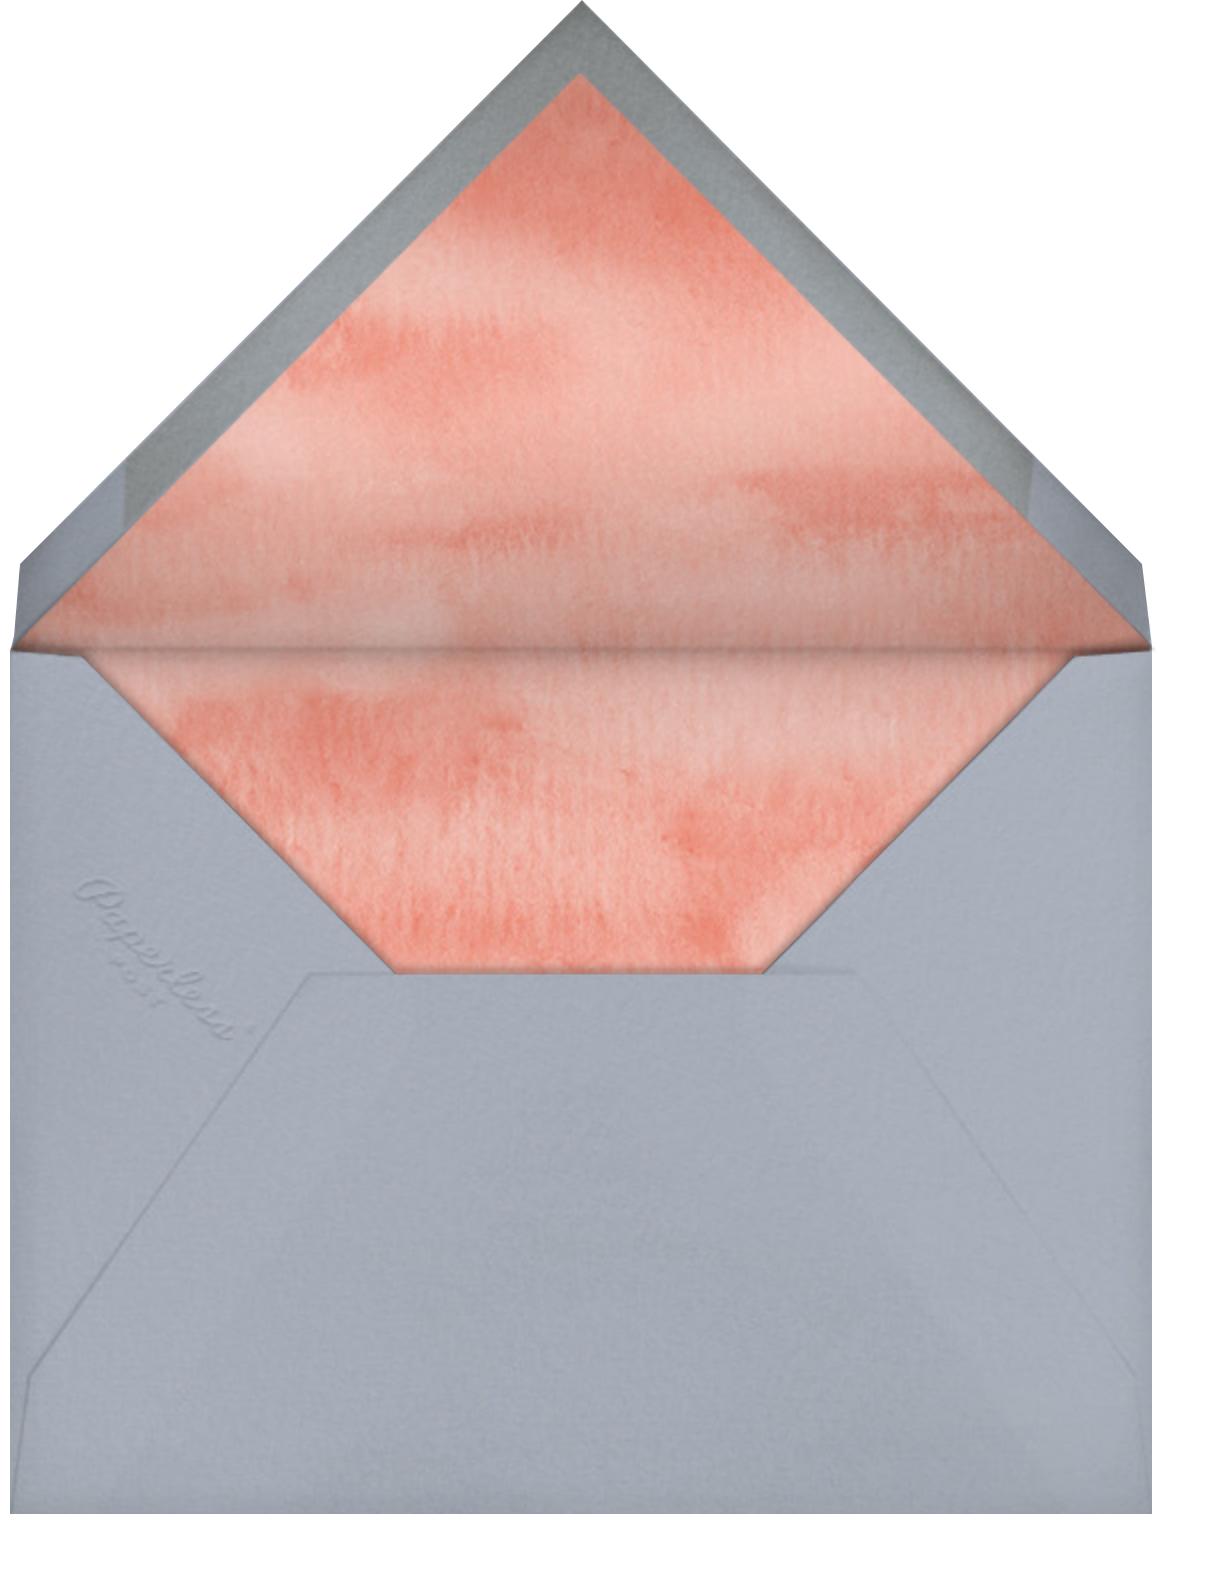 Rose Chintz - Anthropologie - Mother's Day - envelope back